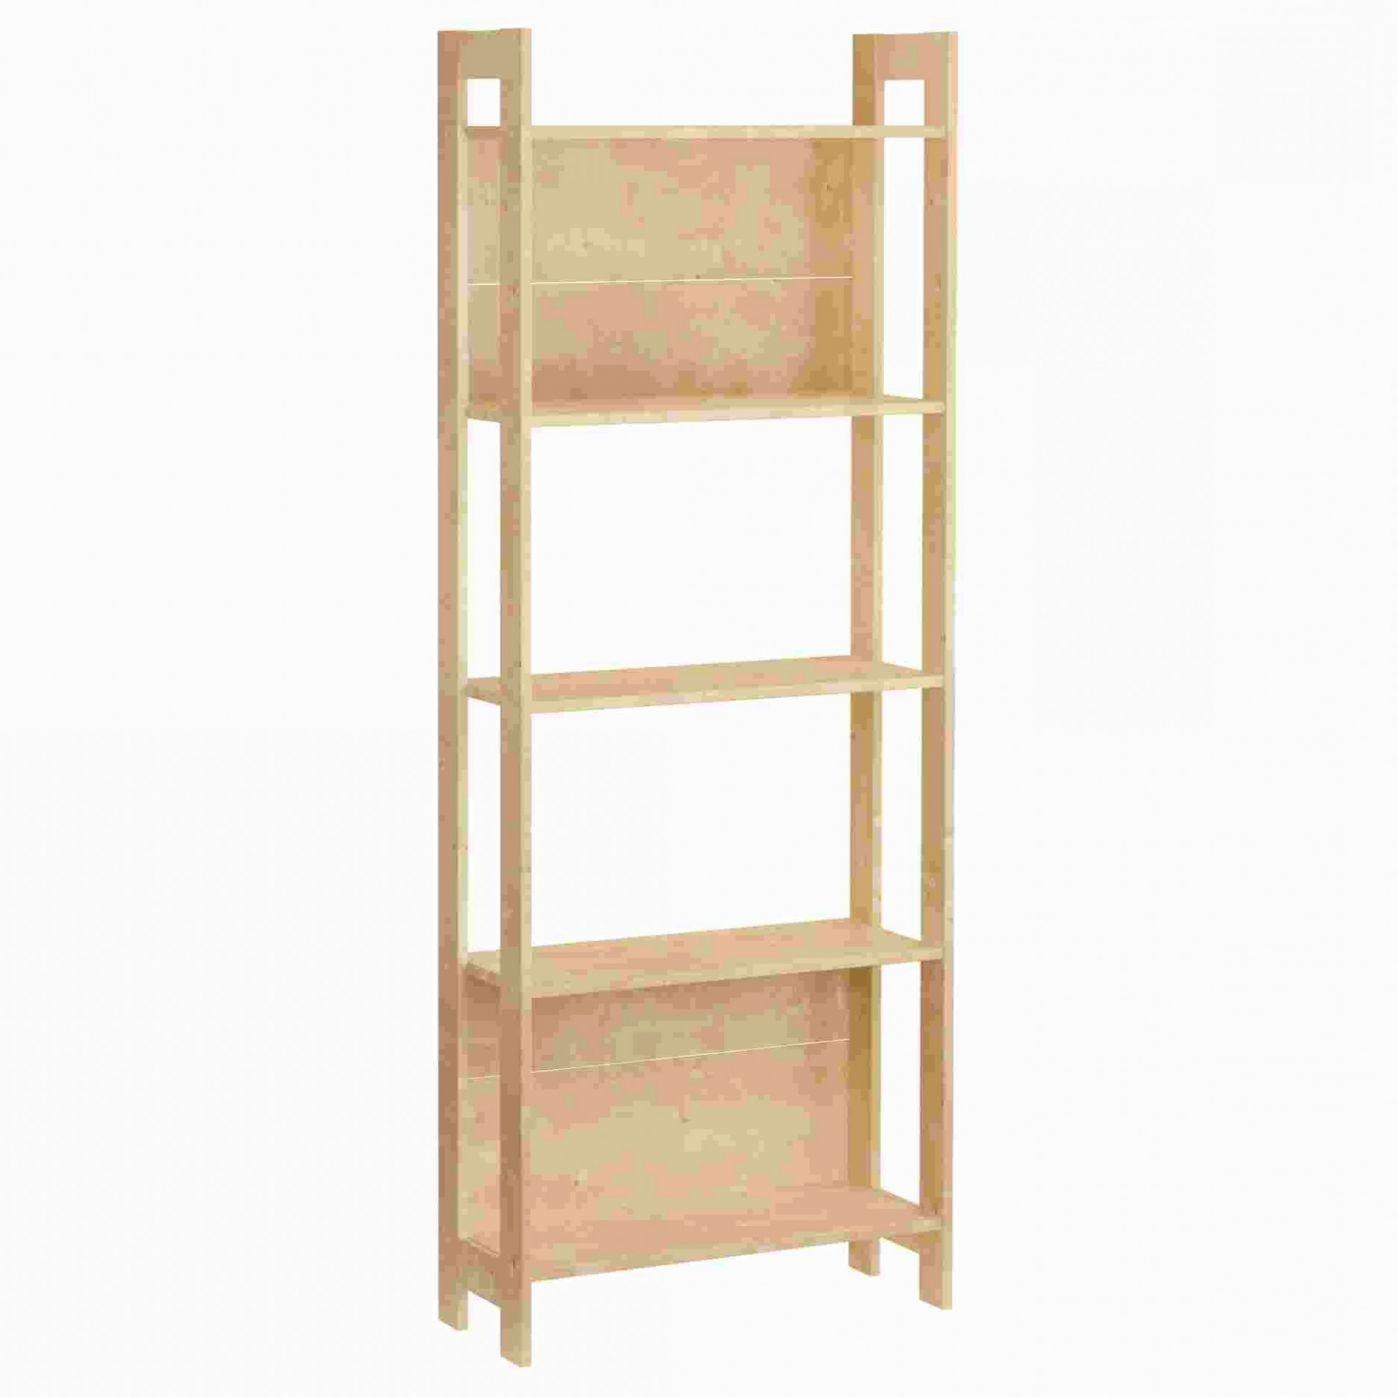 15 Neu Lager Von Regal 15 Cm Bücherregal Wand Regal Holz Badezimmer Regal Holz